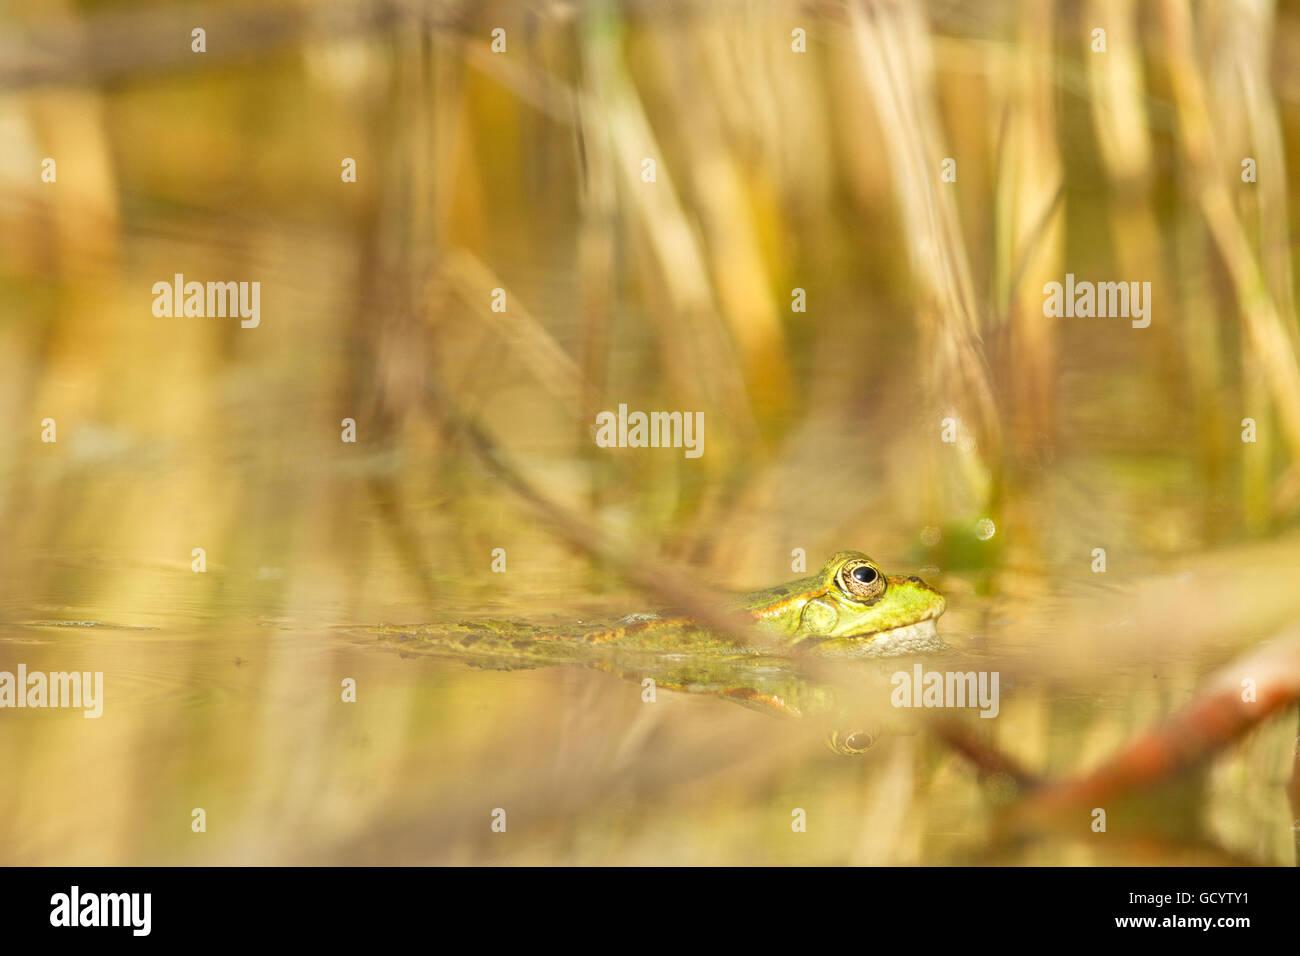 Edible frog (Pelophylax kl. esculentus) in a pond in Frankfurt, Germany. - Stock Image